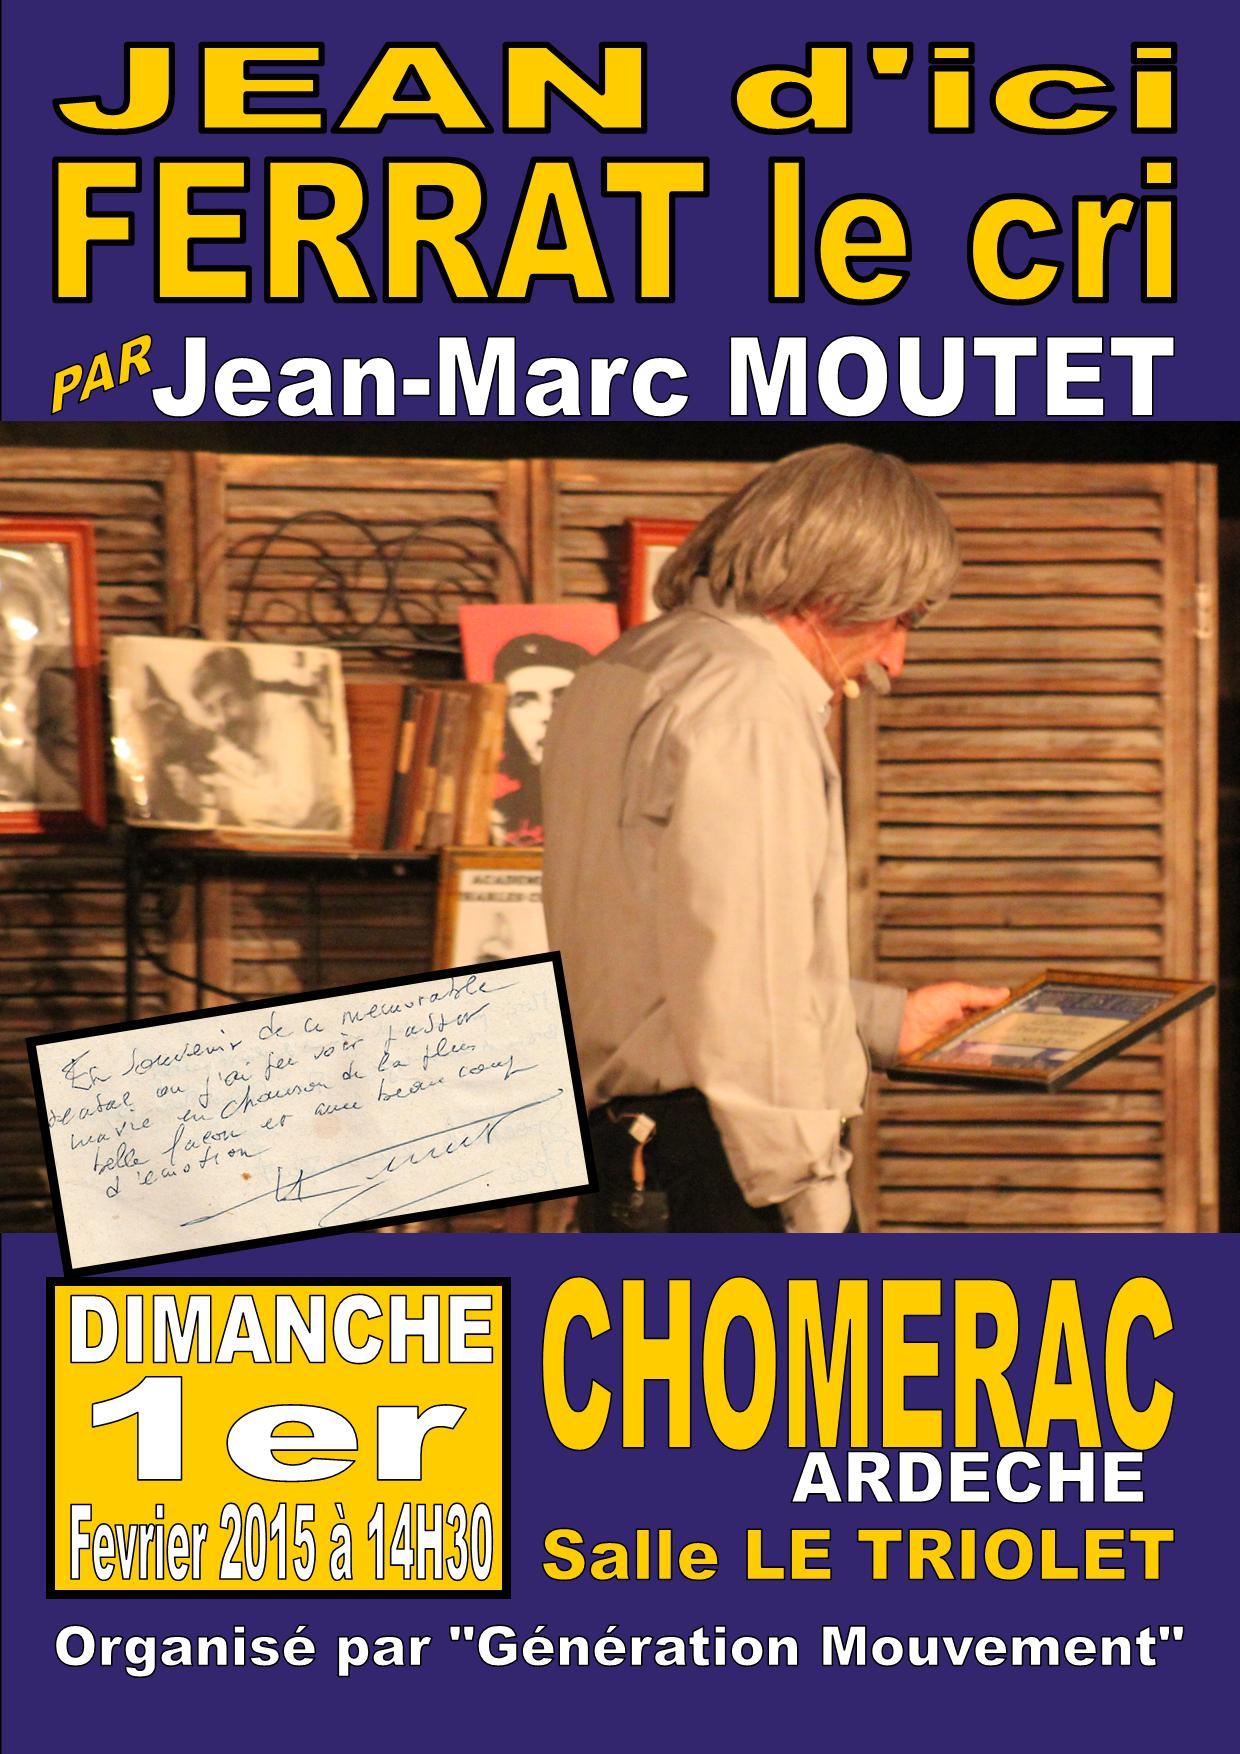 20150201 chomerac